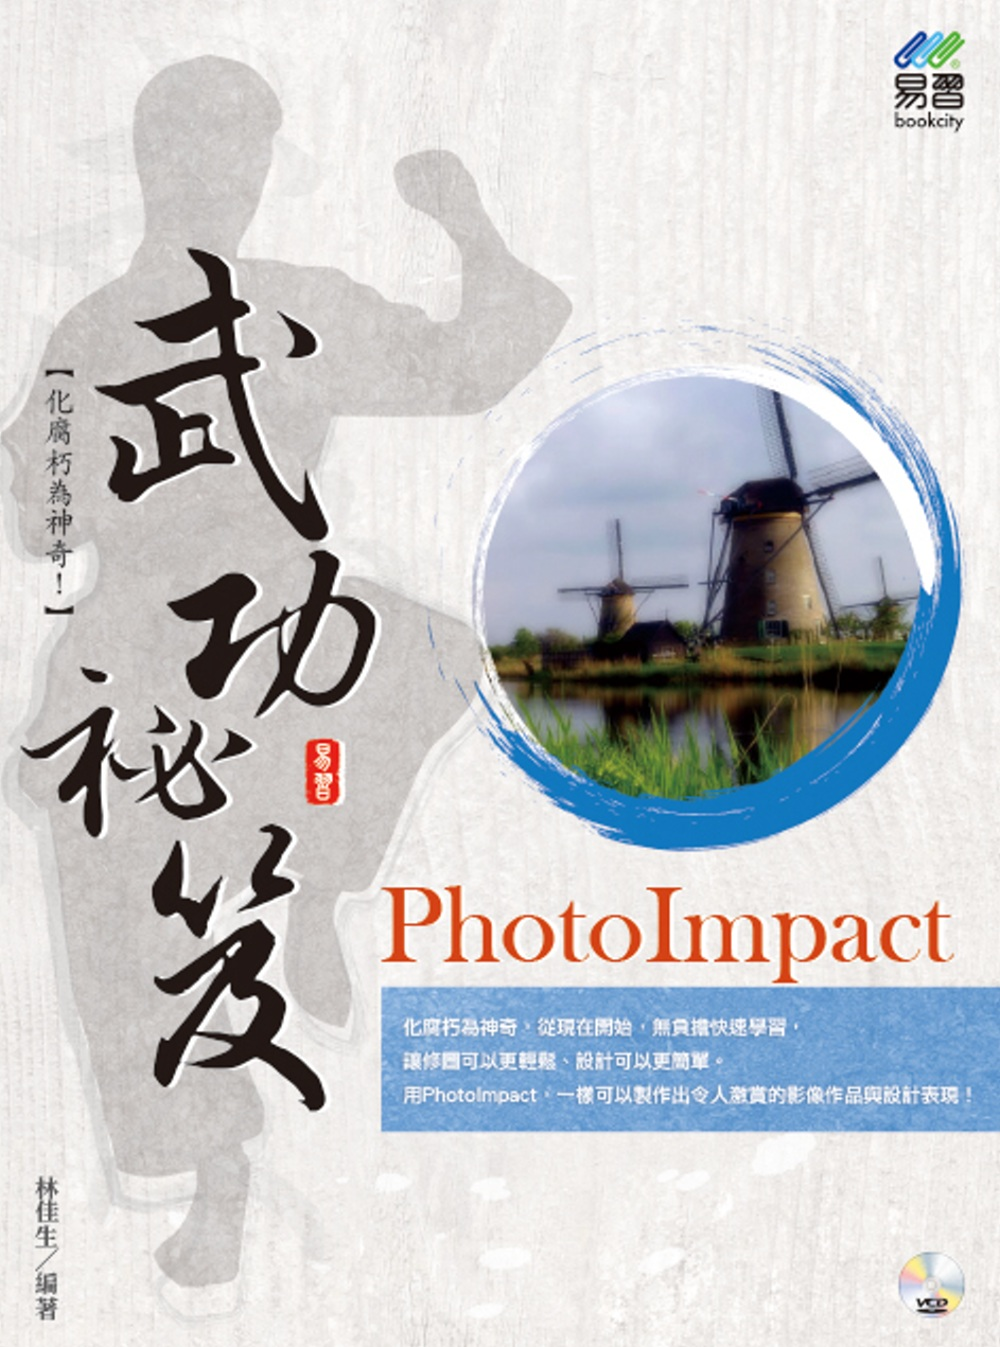 PhotoImpact 武功祕笈